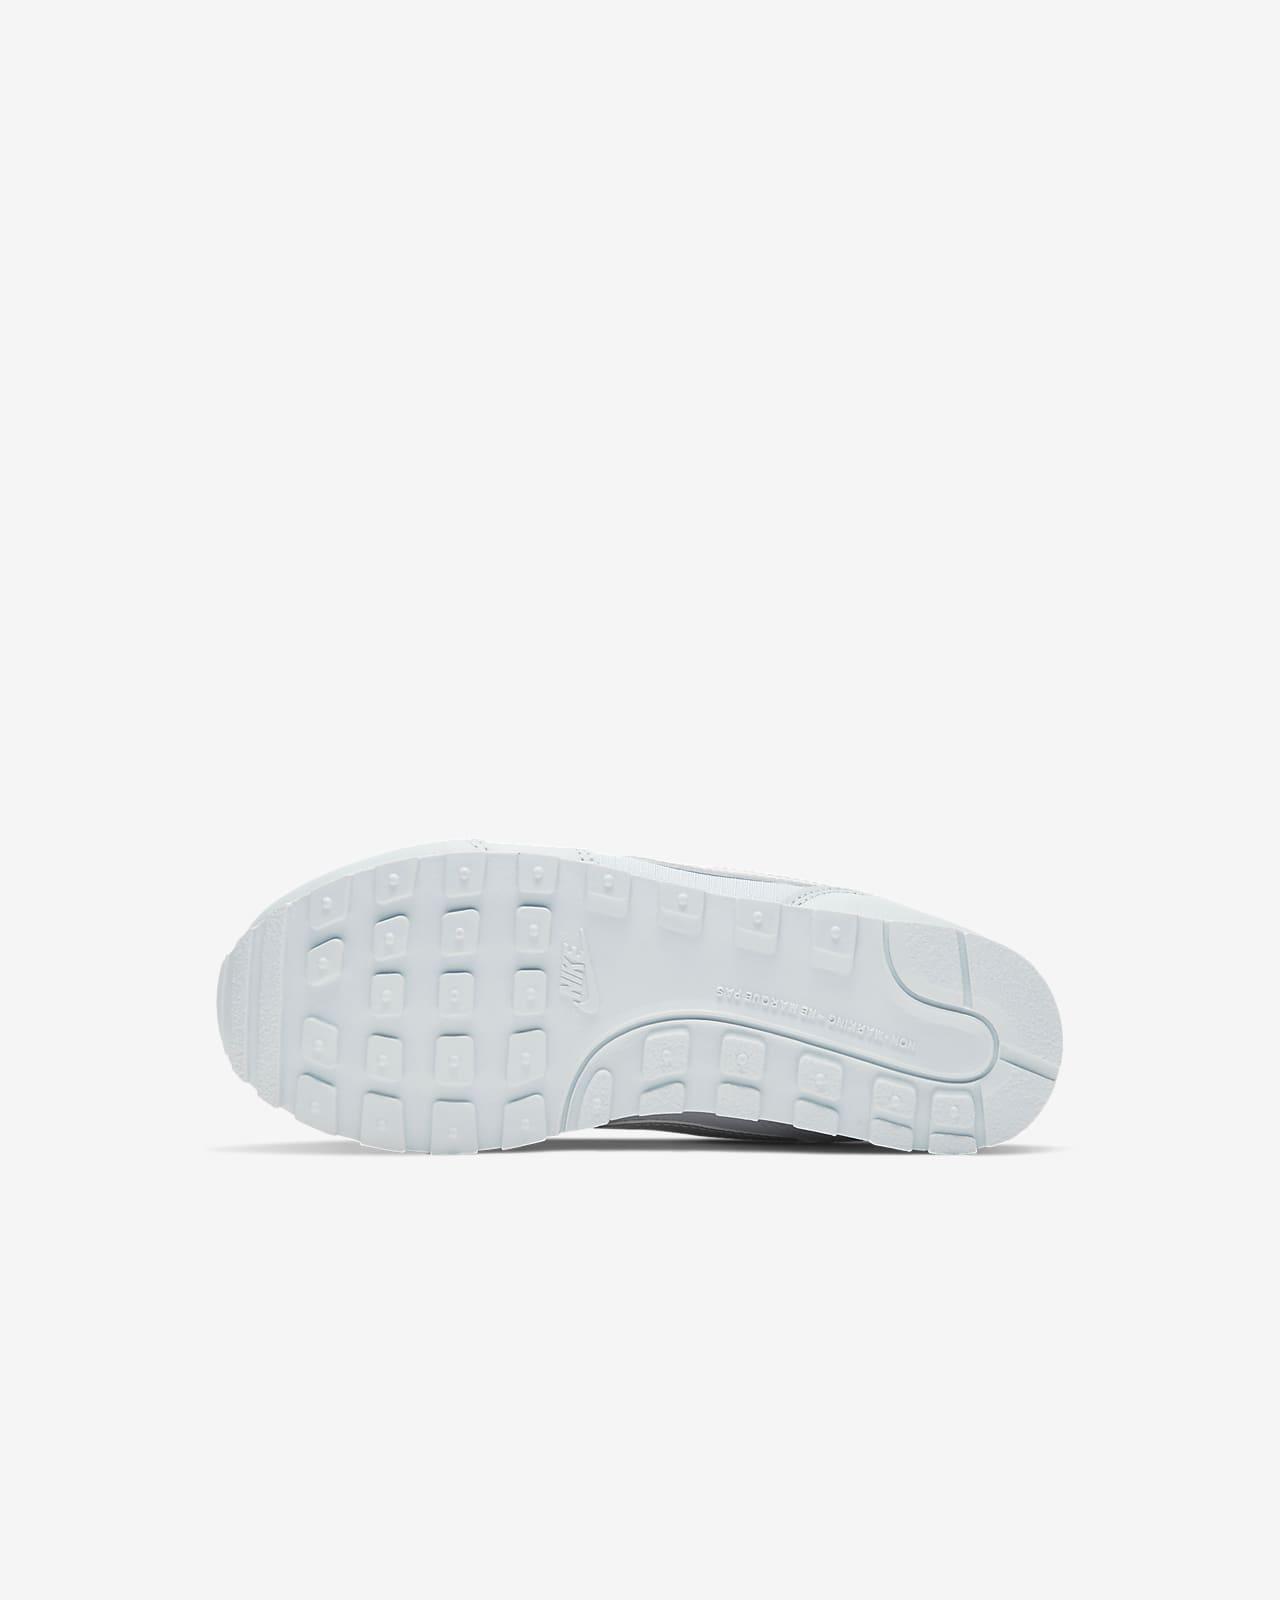 Chaussure Nike MD Runner 2 FP pour Jeune enfant